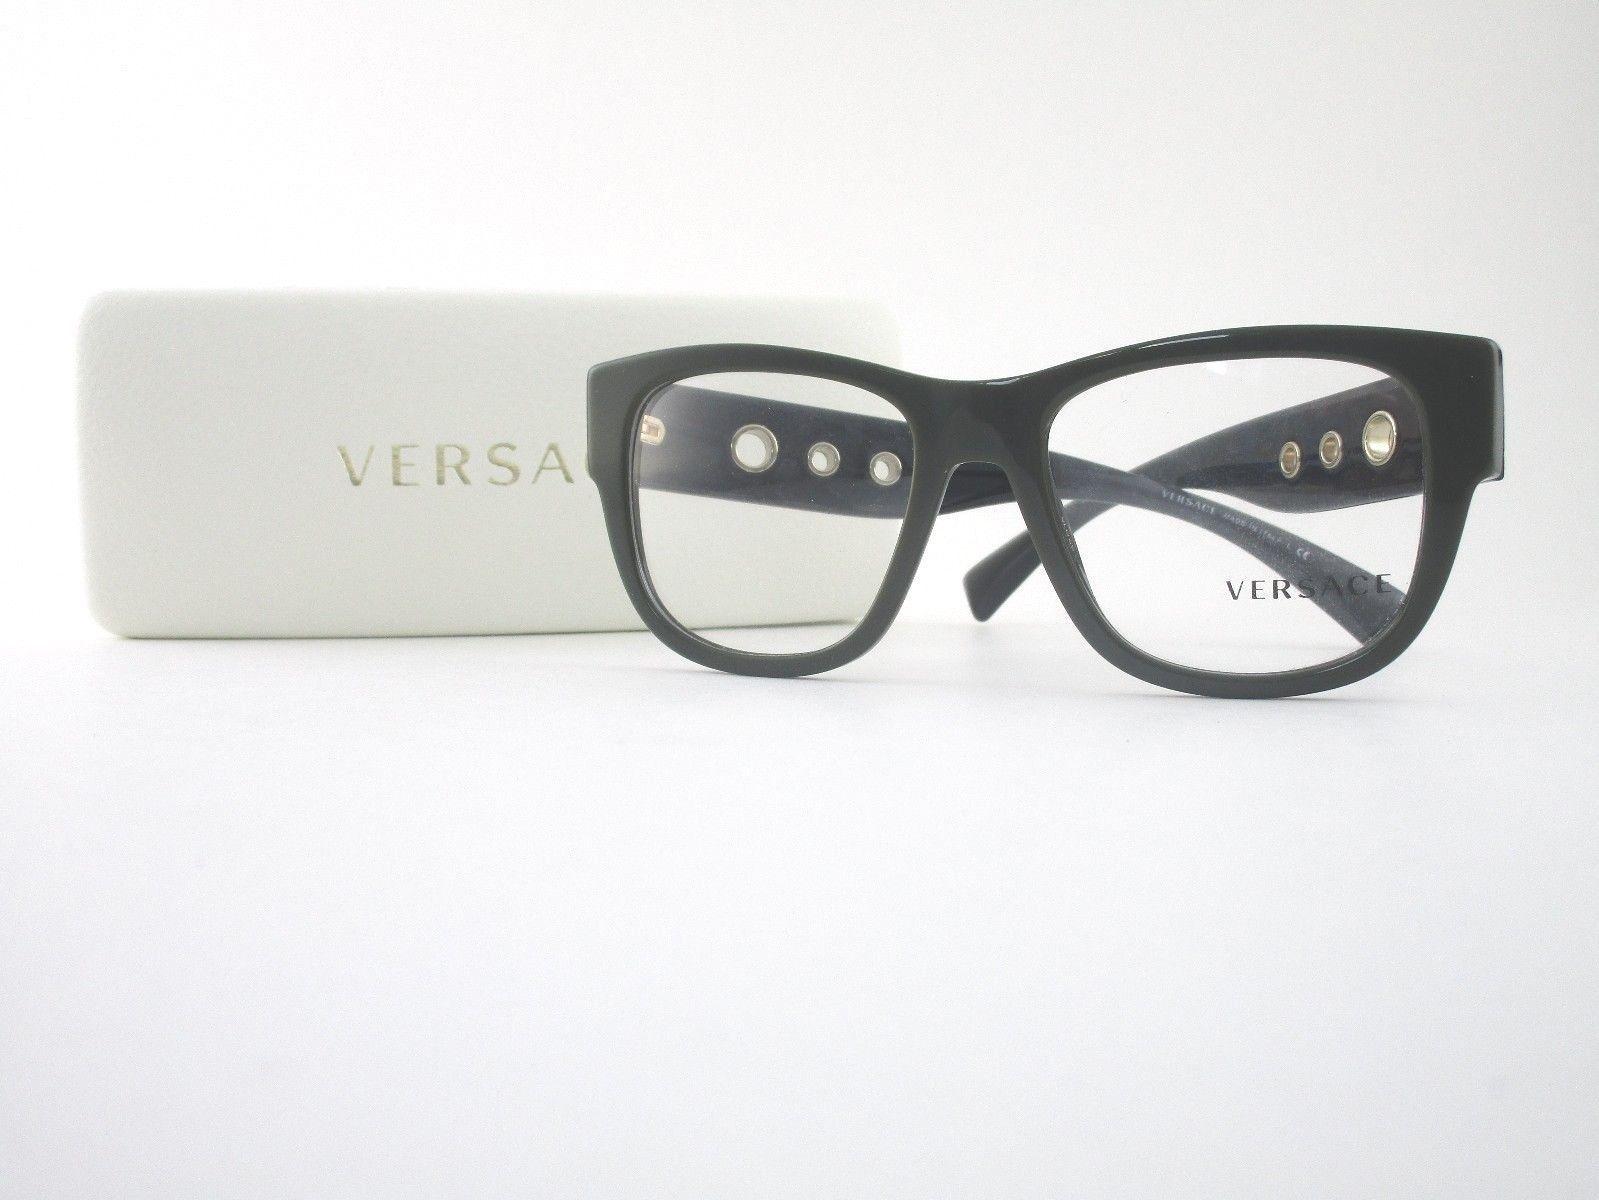 42a0df92e69 Versace MOD3230 5193 Optical Frame Bold Dark and 19 similar items